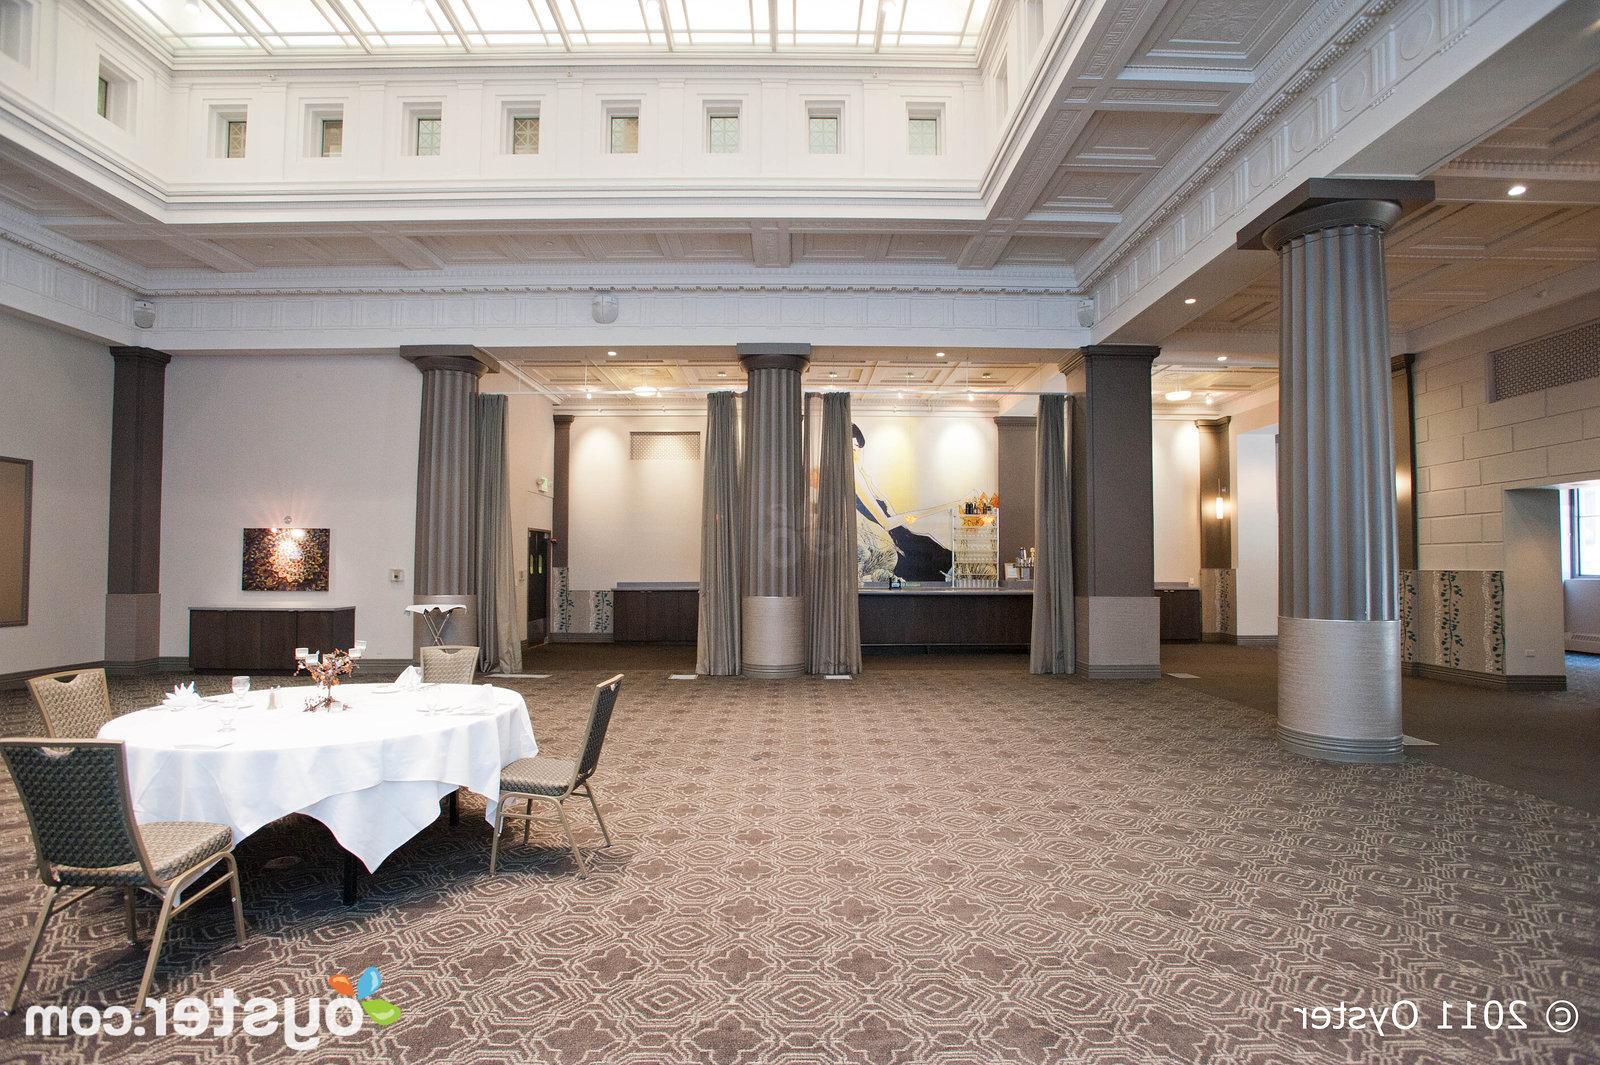 The Magnolia Ballroom at the Magnolia Hotel Denver